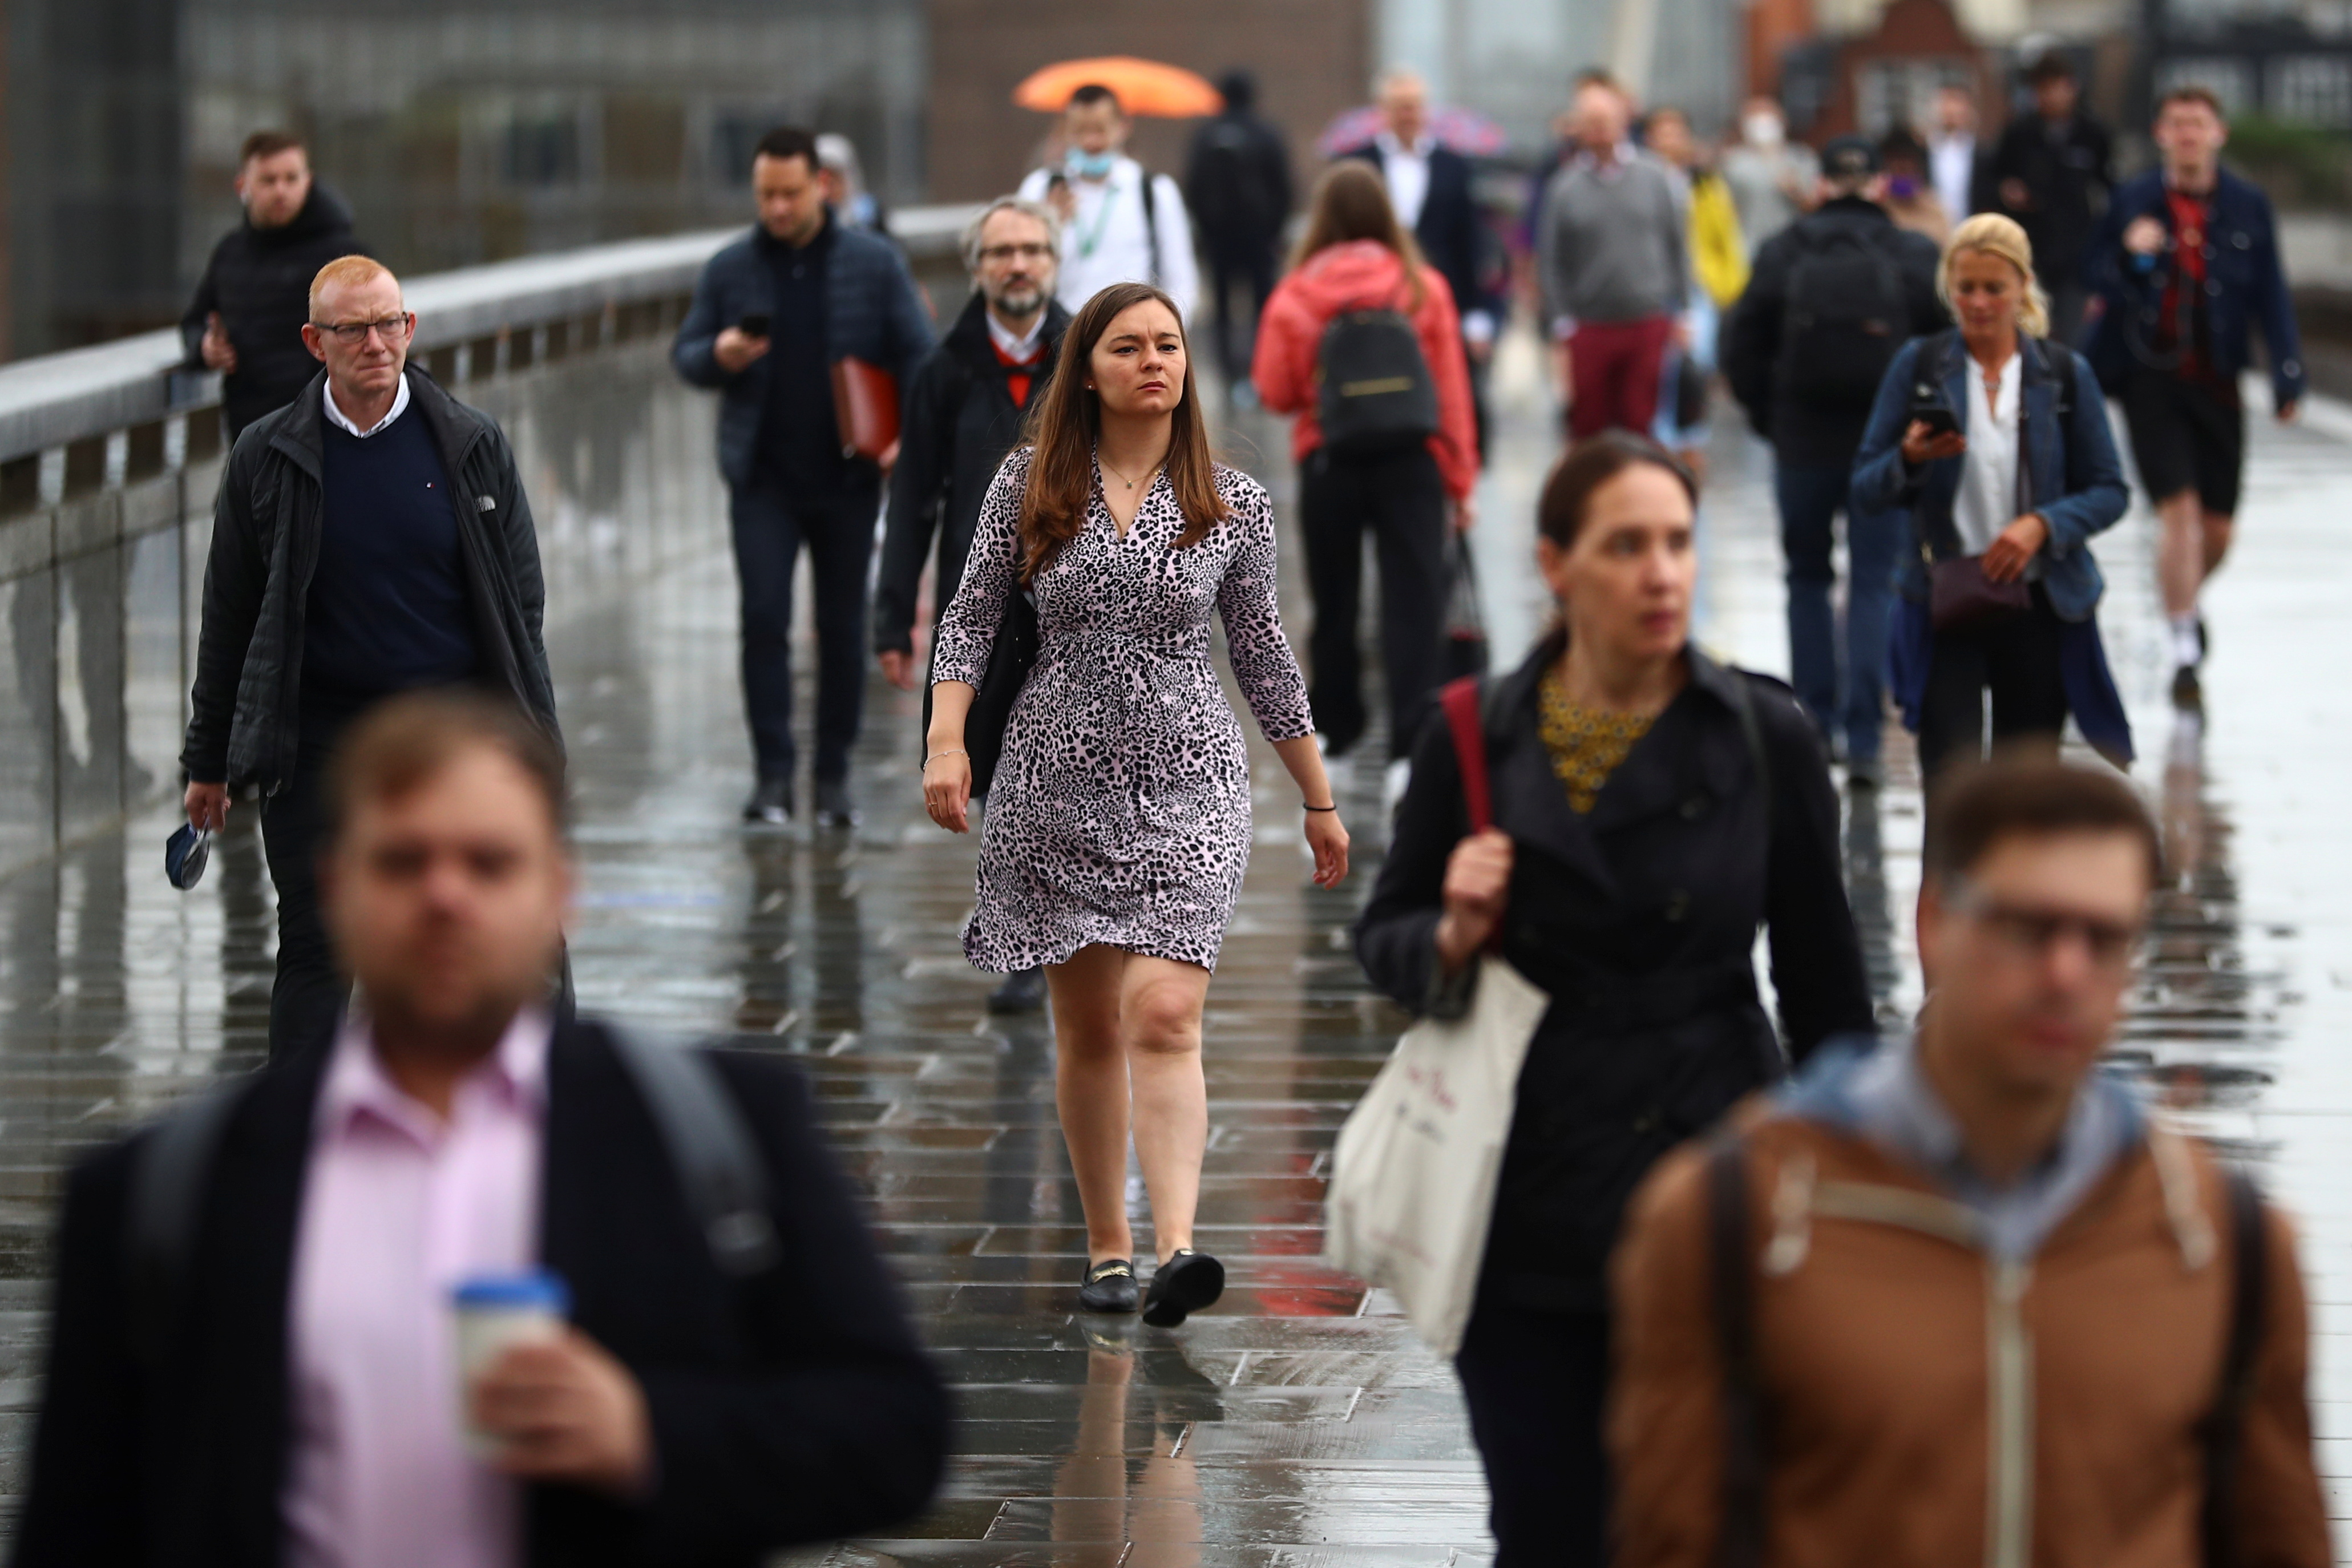 Commuters cross the London Bridge, amid the spread of the coronavirus disease (COVID-19), in London, Britain July 6, 2021. REUTERS/Hannah McKay